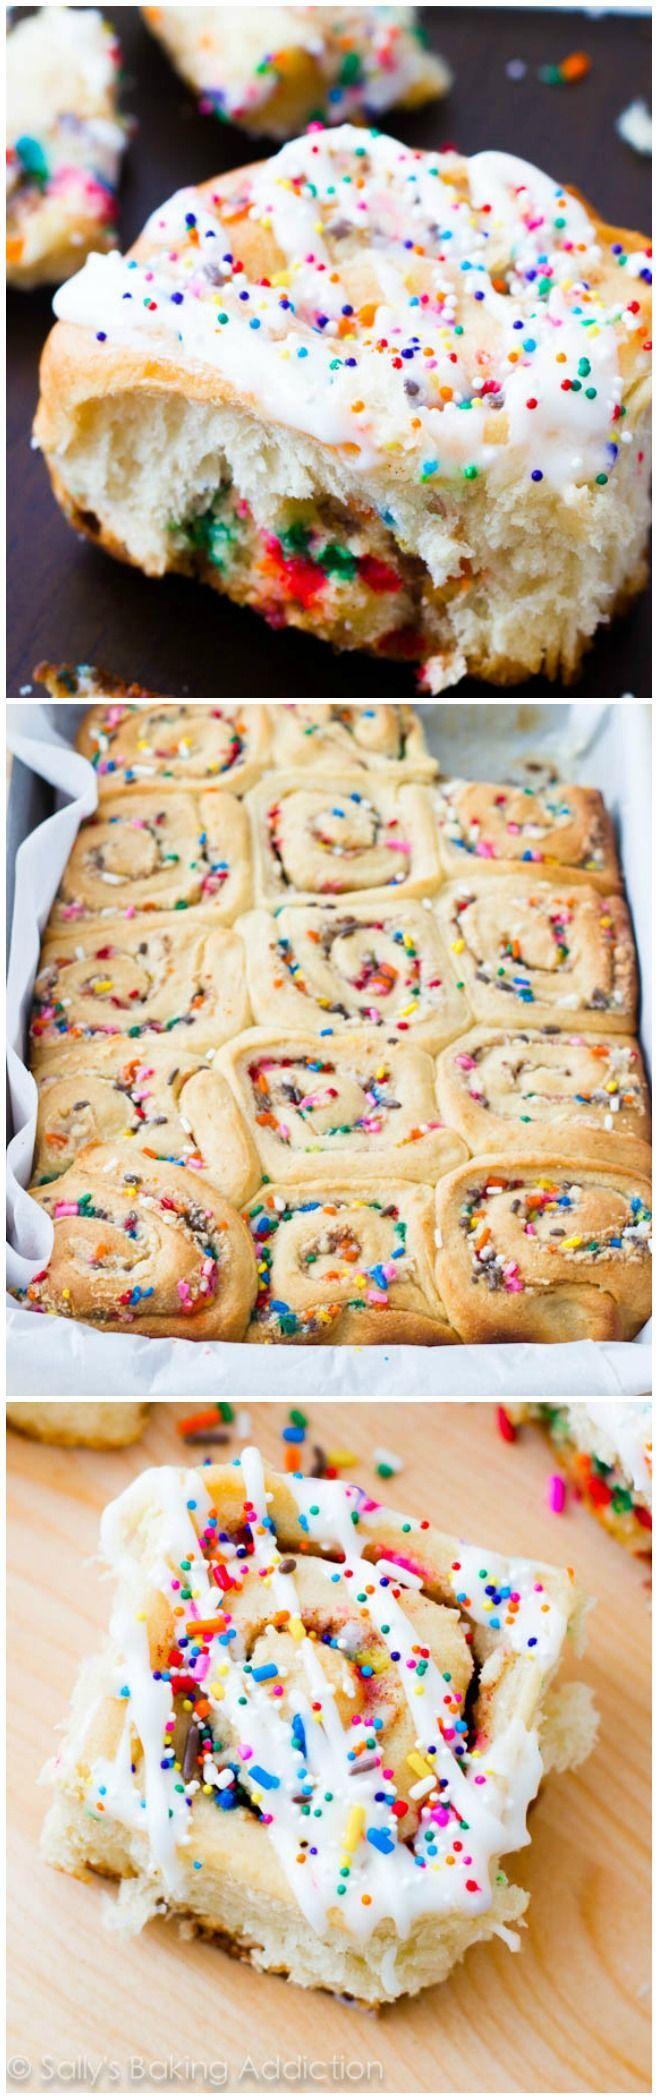 Easter Polka Dot Cake | SugarHero.com   #homedecor #home #lighting